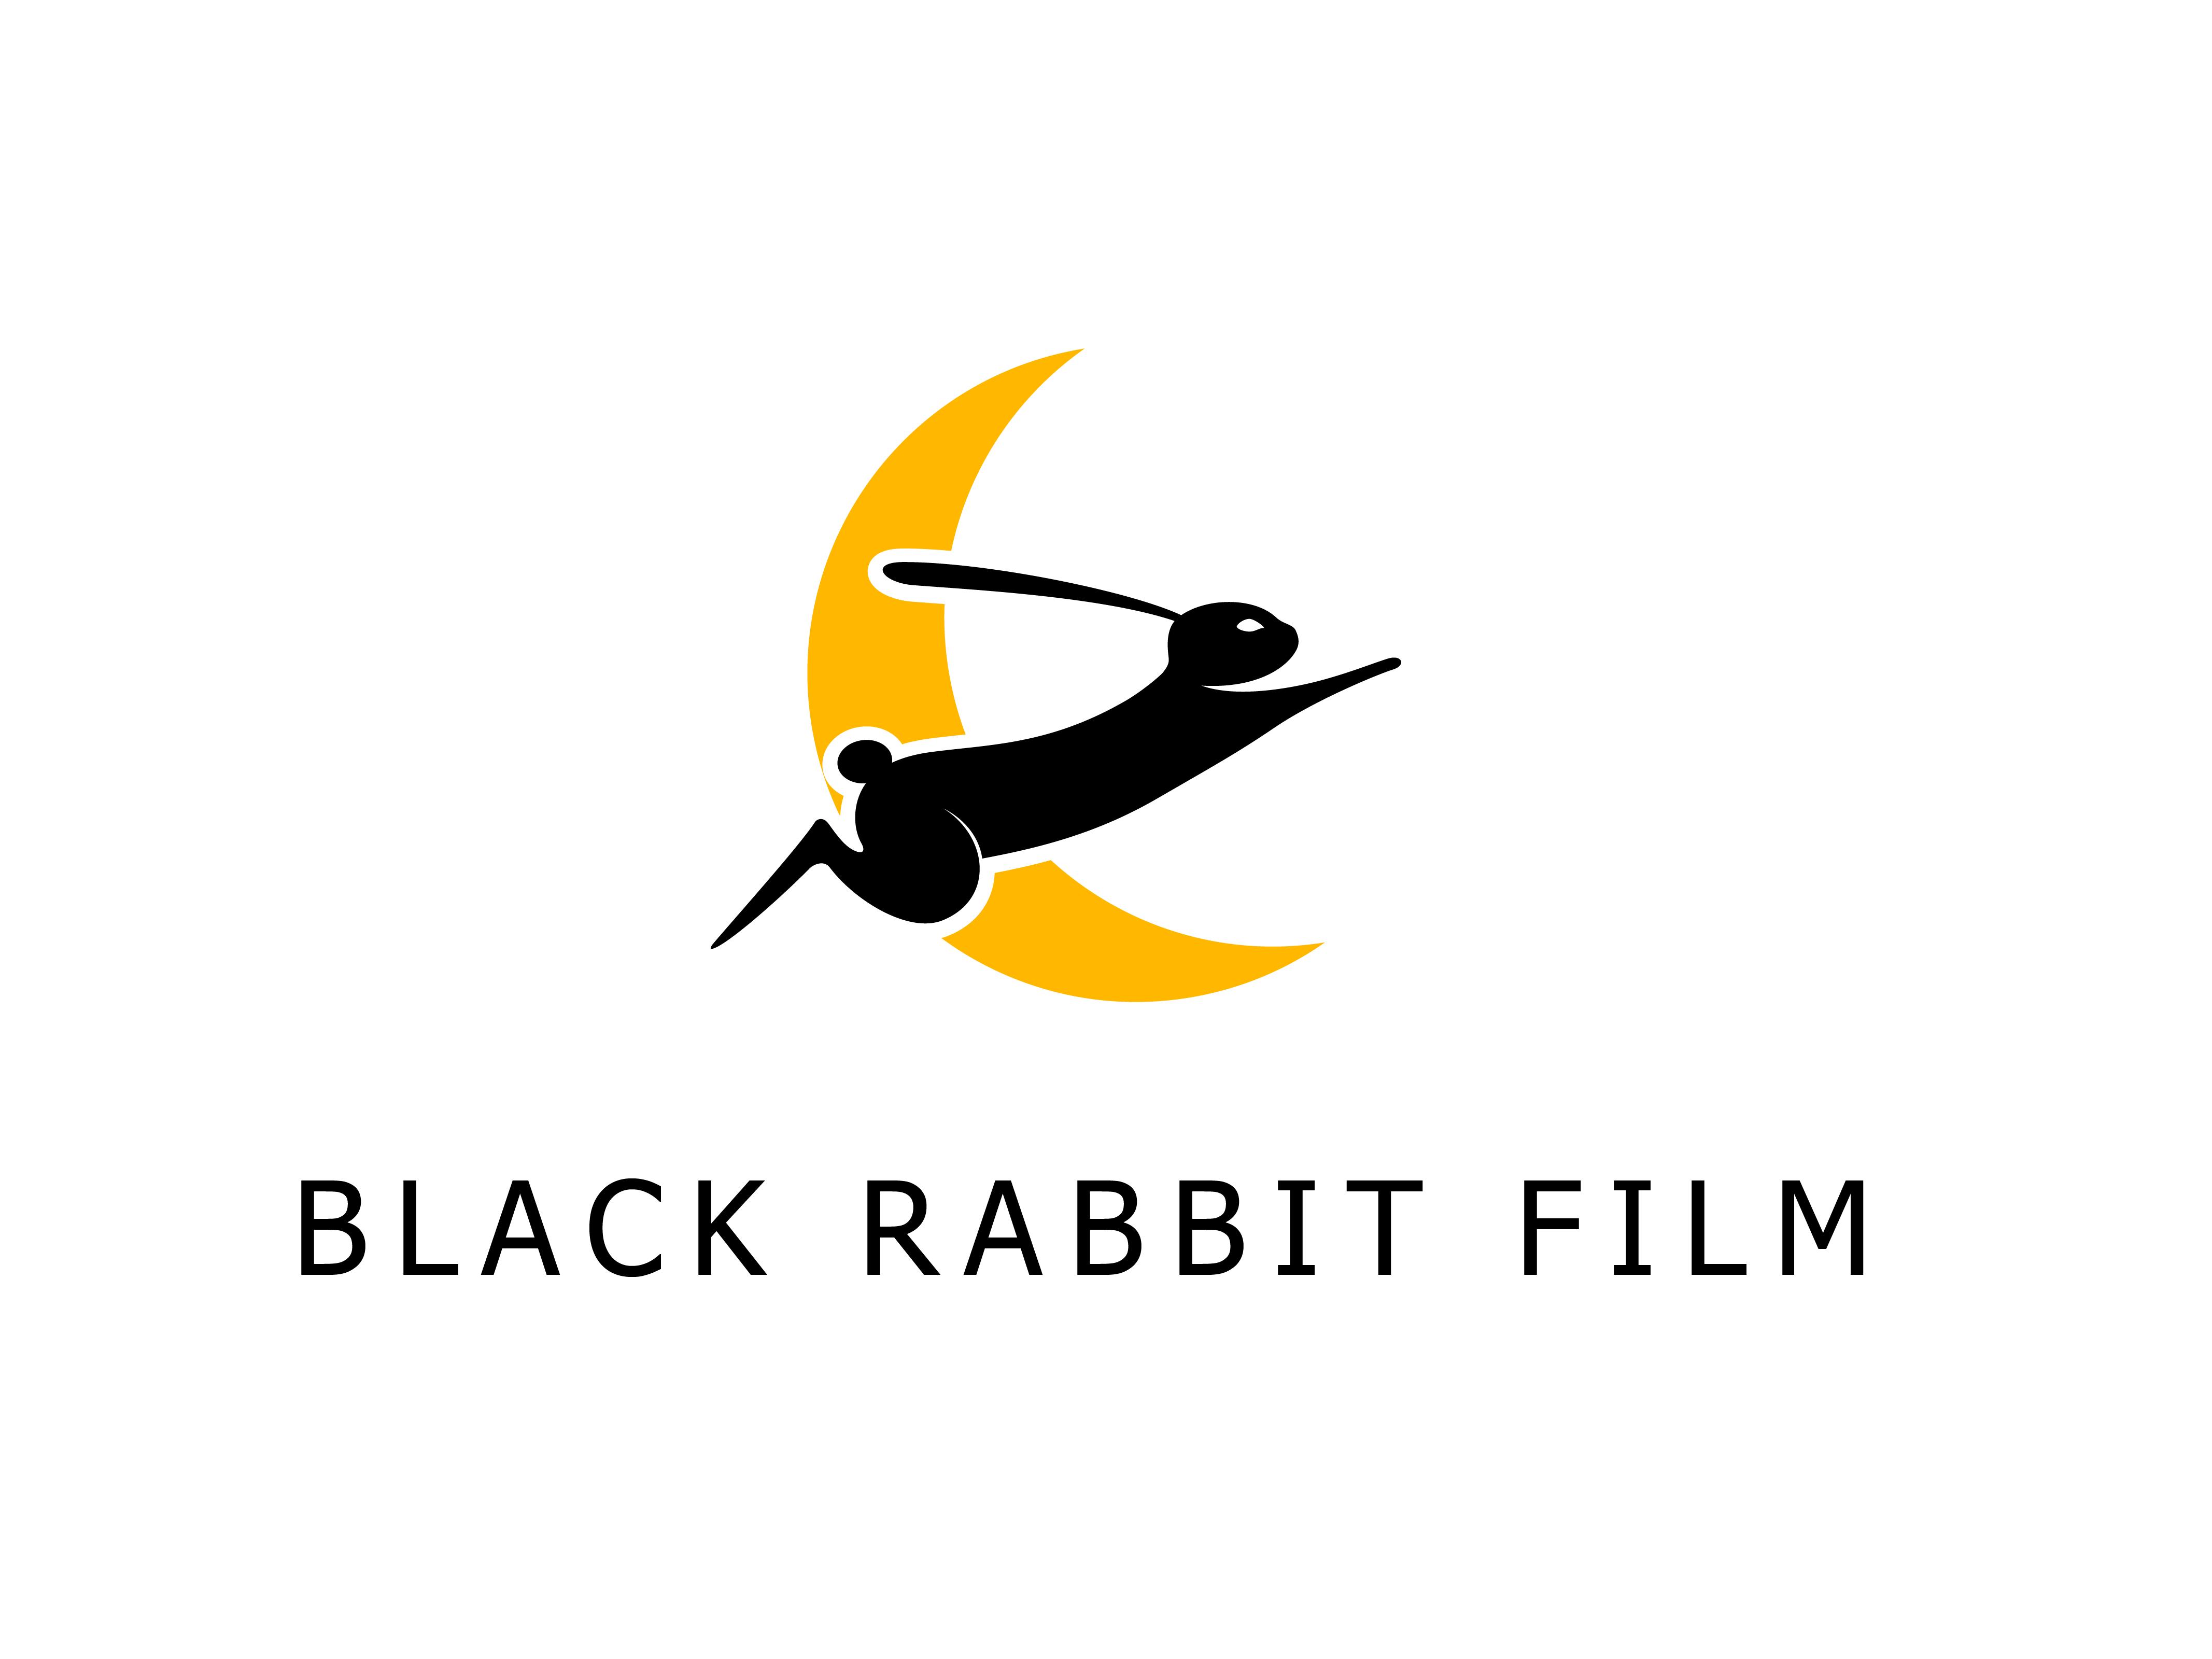 Black Rabbit Film